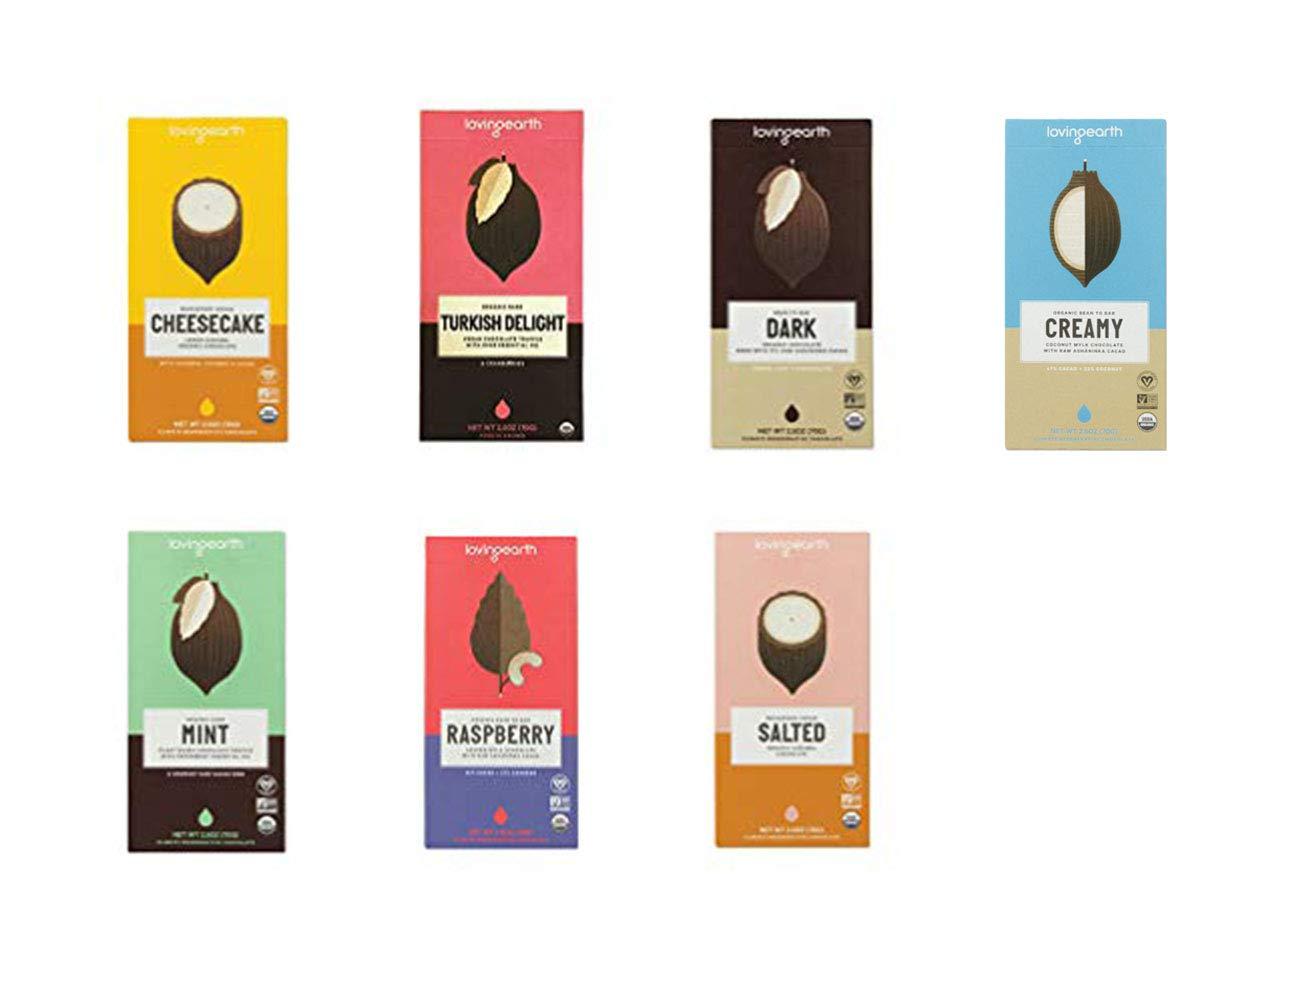 Loving Earth, USDA Organic Chocolate bar, 6 Flavor Variety Pack (Salted, Mint, Dark, Turkish Delight, Cheesecake & Raspberry)